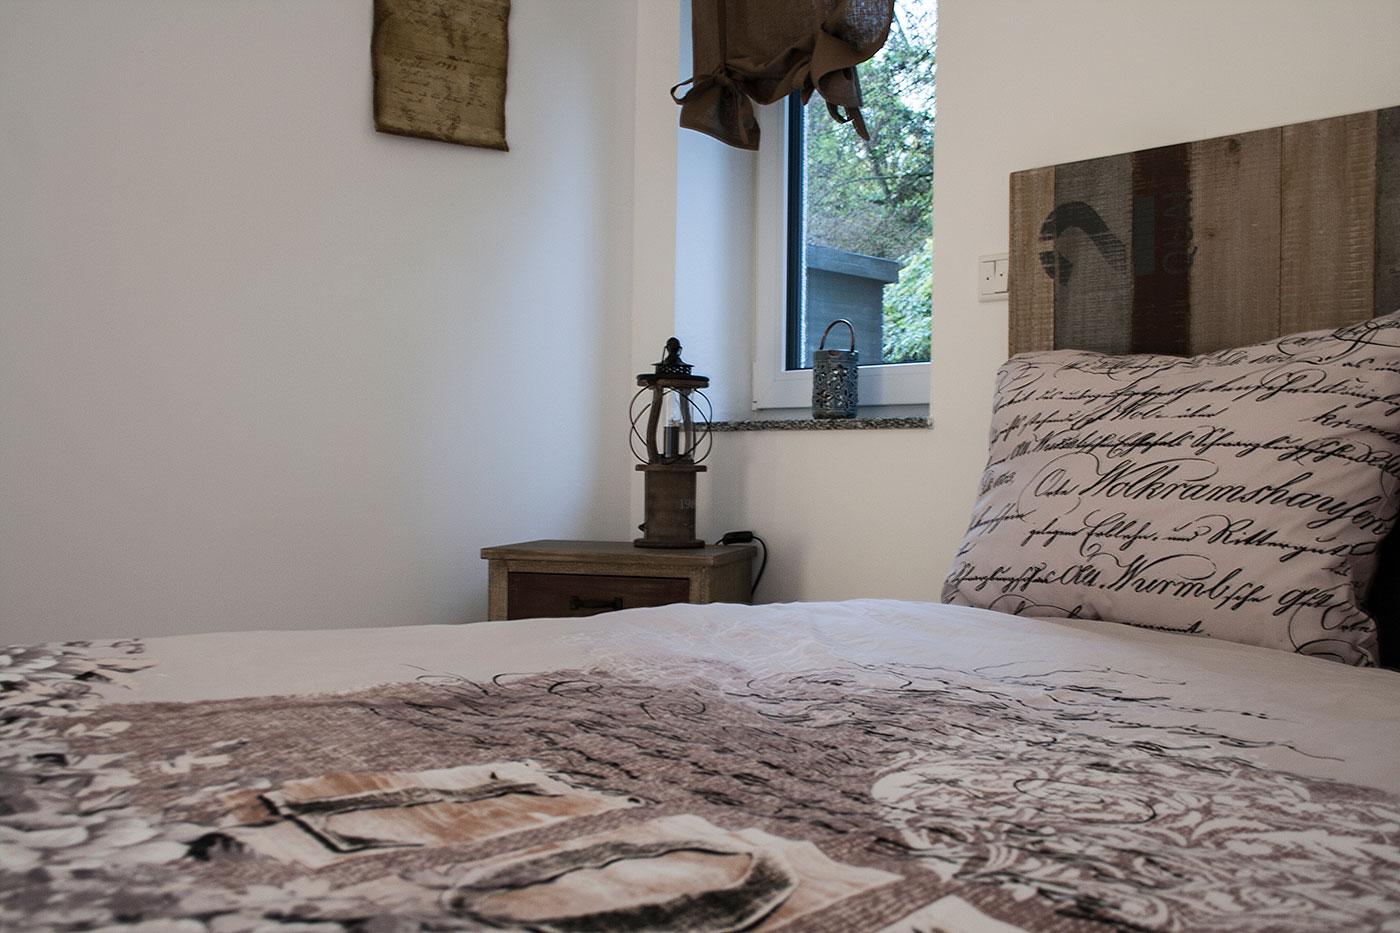 Ferienwohnung in Bendorf-Sayn | Viva la Vida